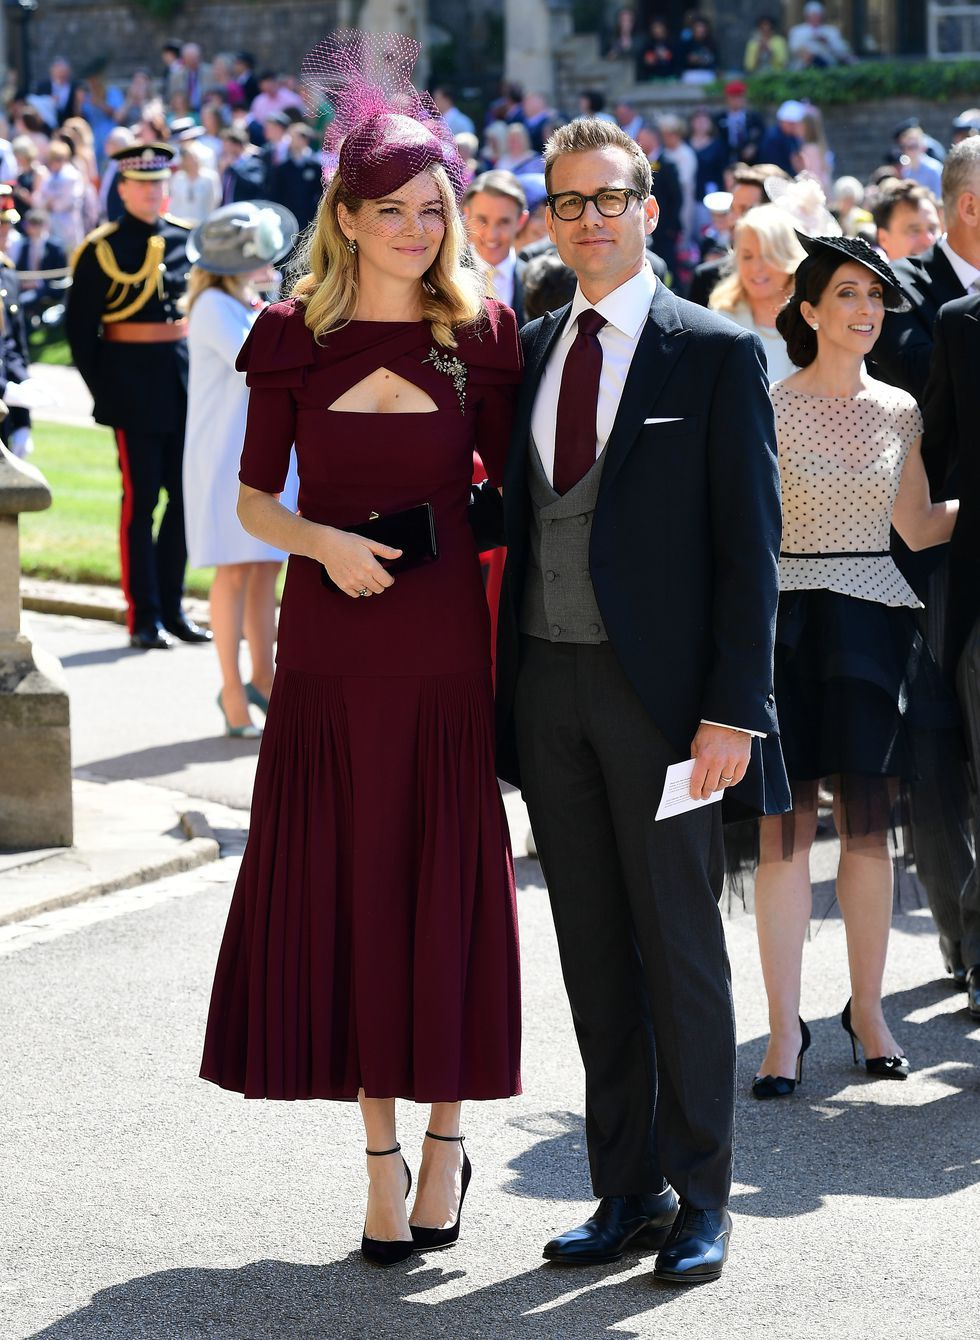 All The Best Dressed Guests From Prince Harry And Meghan Markle S Royal Wedding Vestidos Legais Roupas Para Casamento Convidados Traje De Casamento [ 1340 x 980 Pixel ]